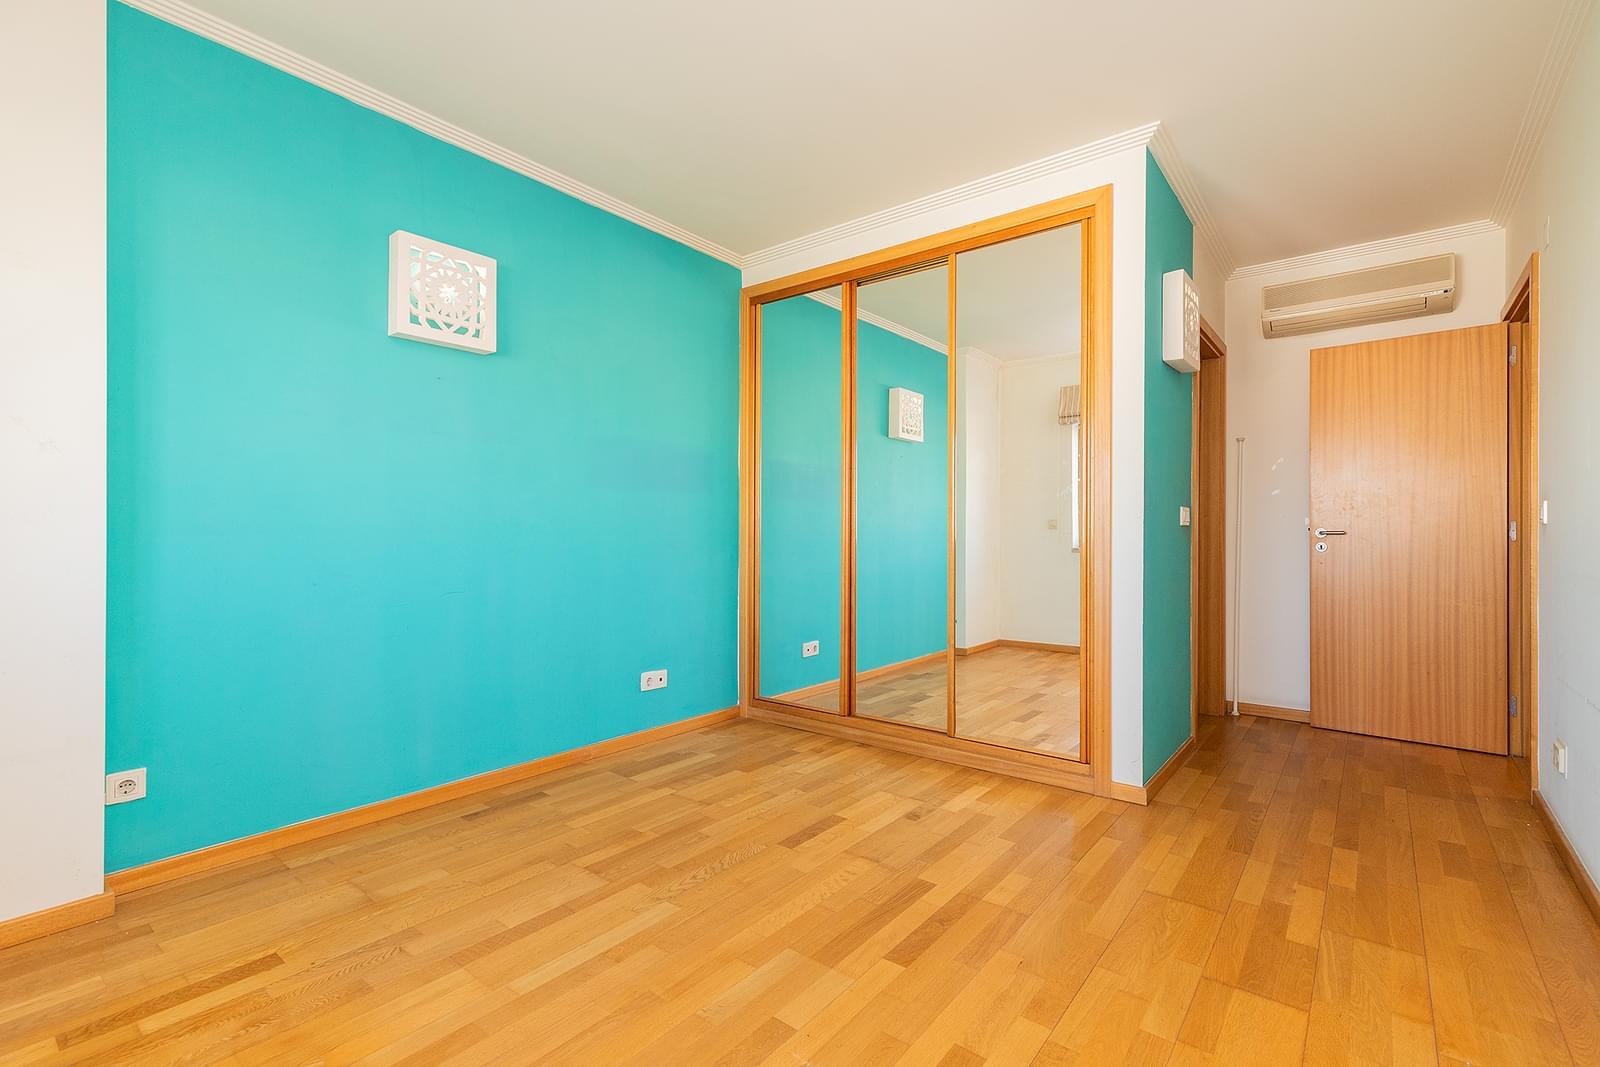 pf18953-apartamento-t3-lisboa-e8e2e354-5c93-49be-ac8b-0d329e1be038